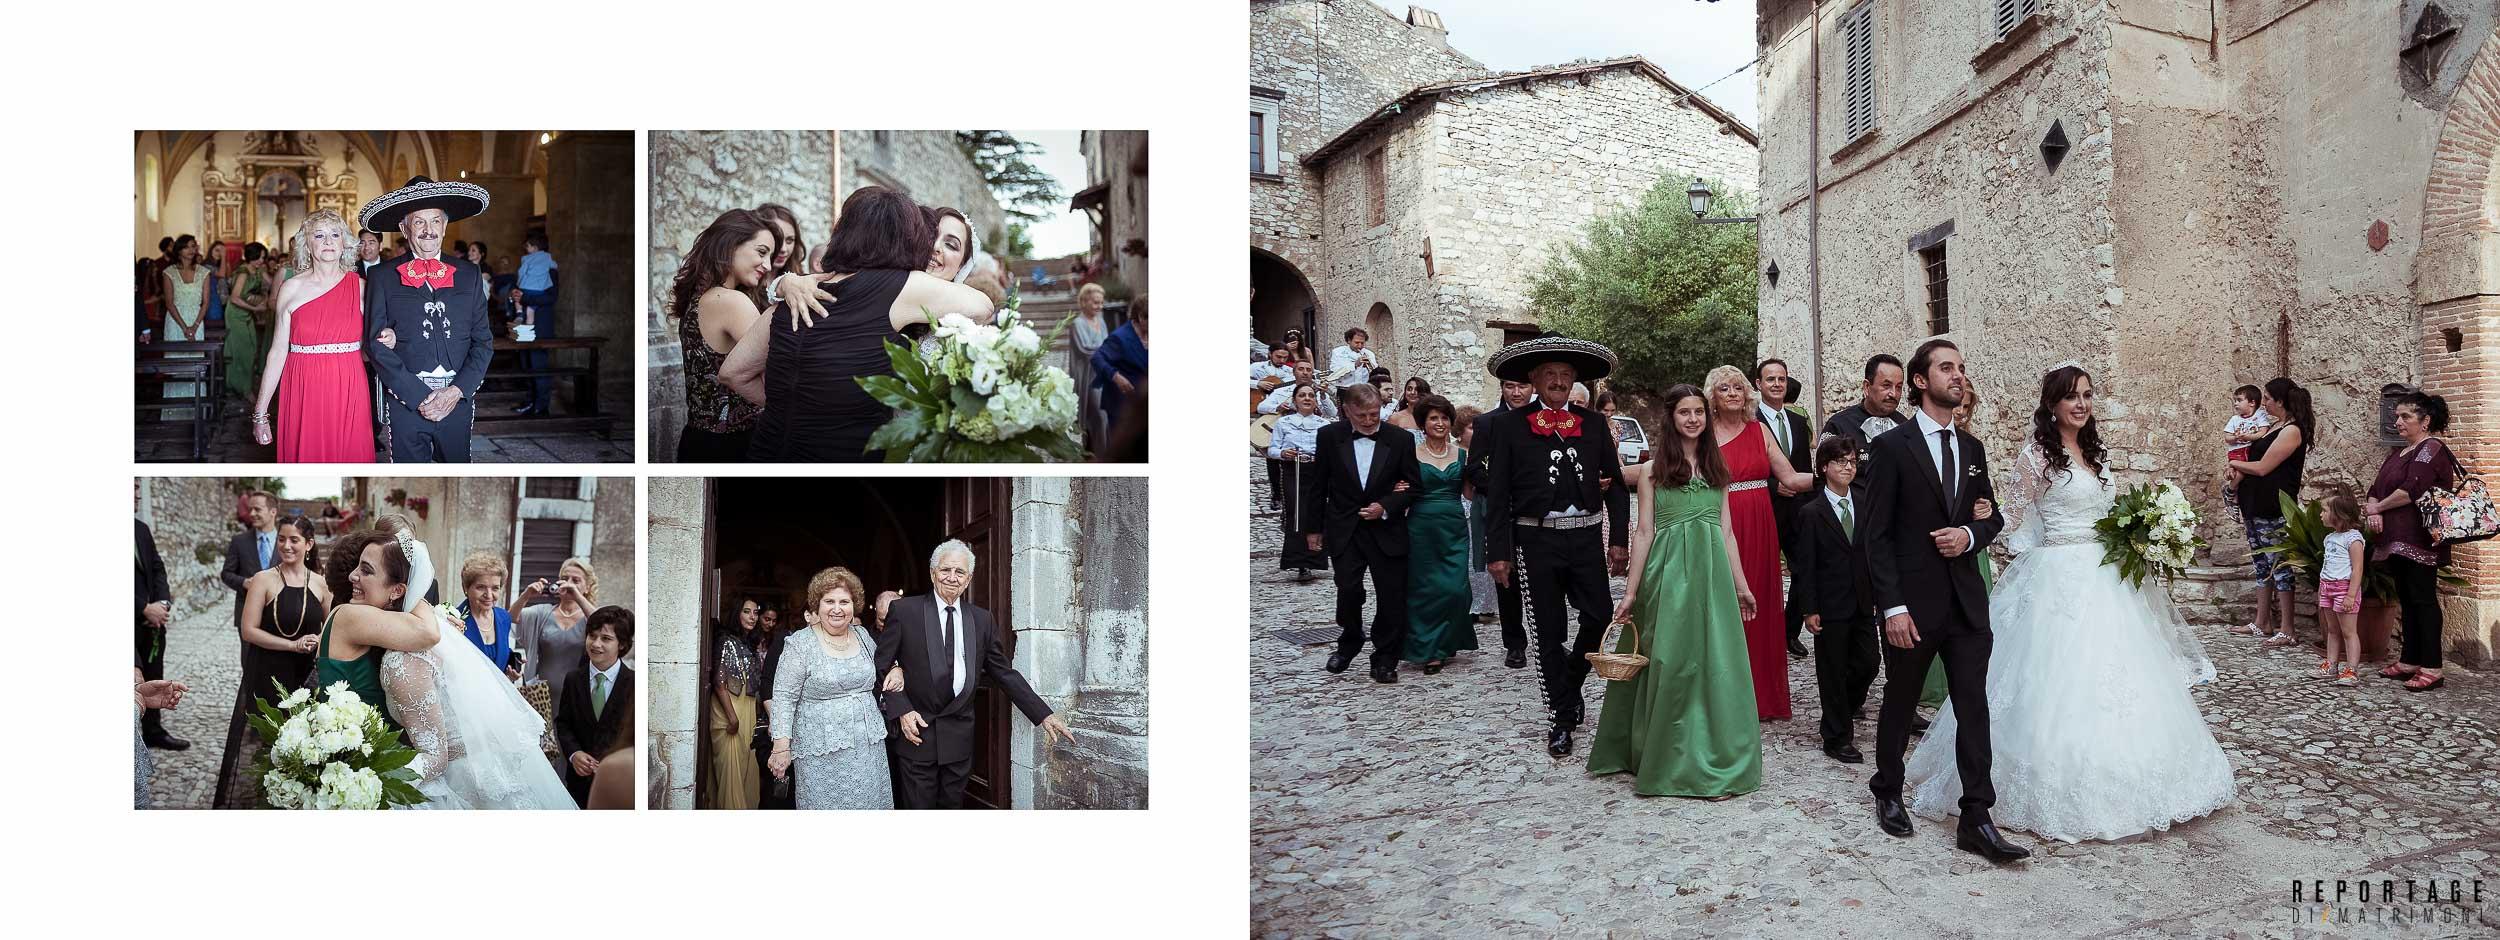 labro_wedding11